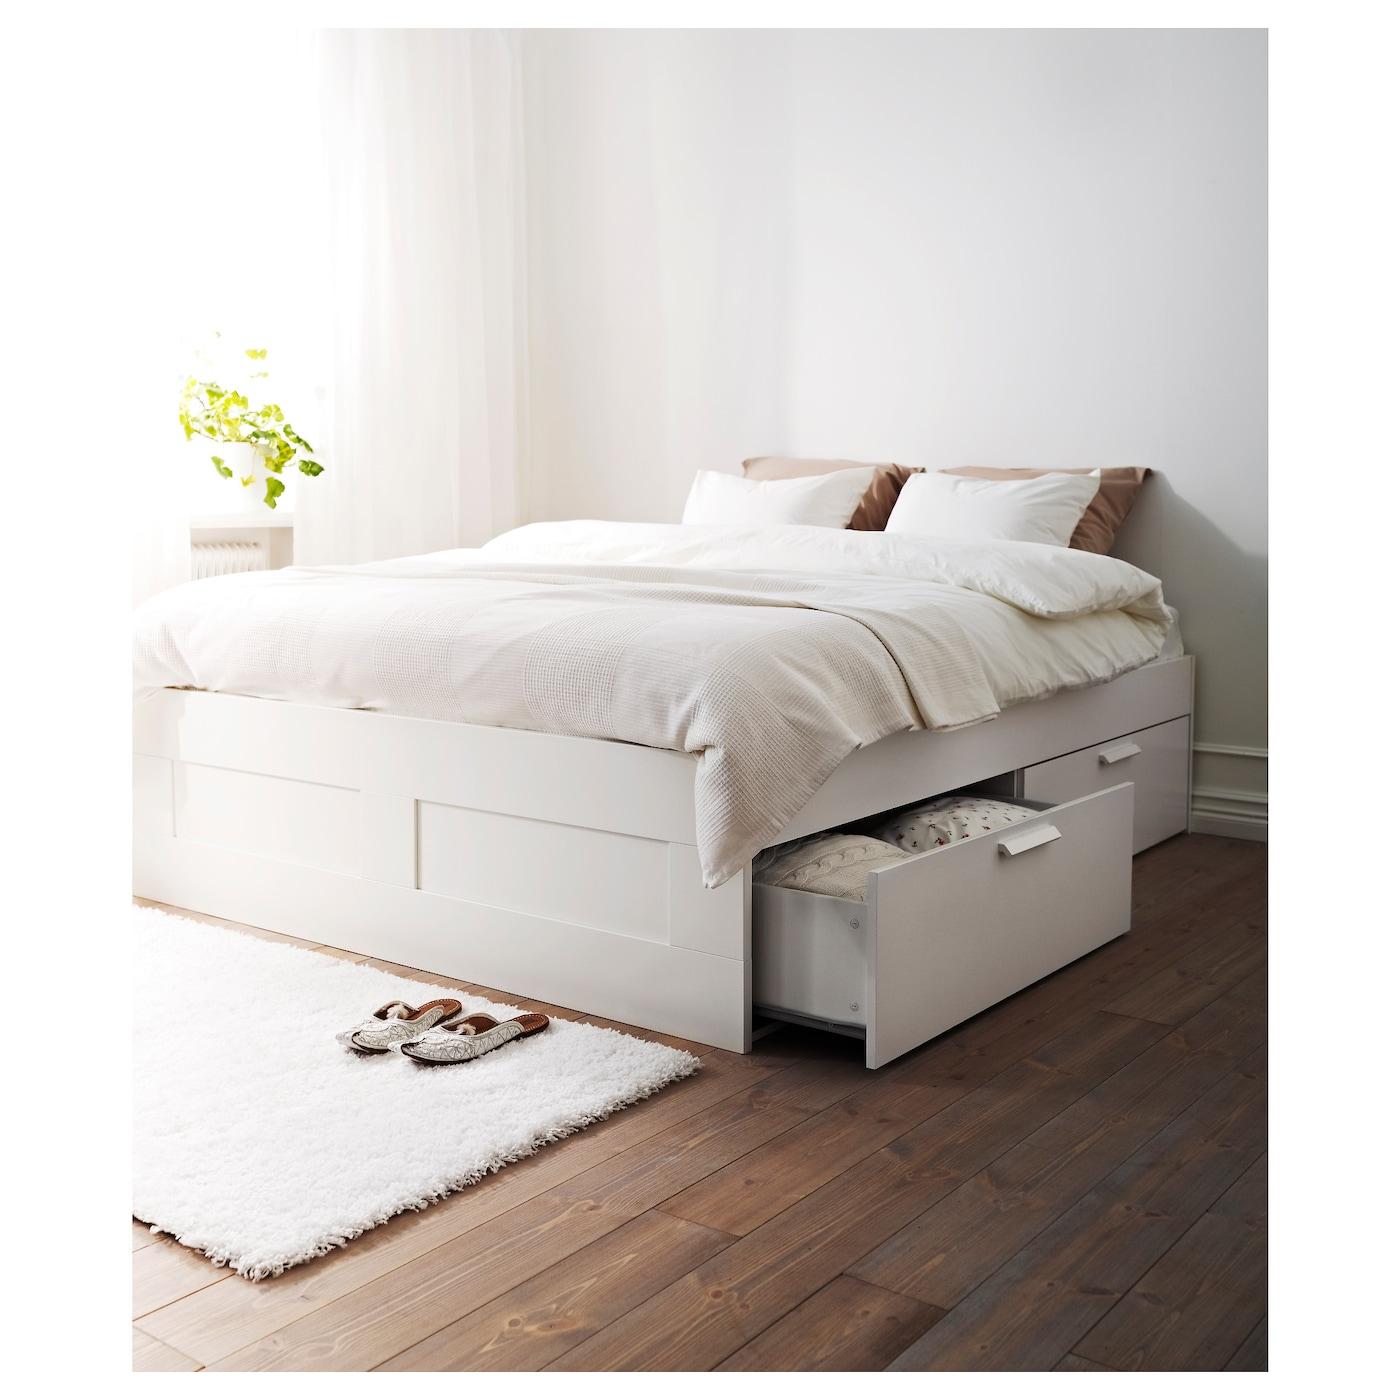 BRIMNES Bed frame with storage White 140 x 200 cm - IKEA